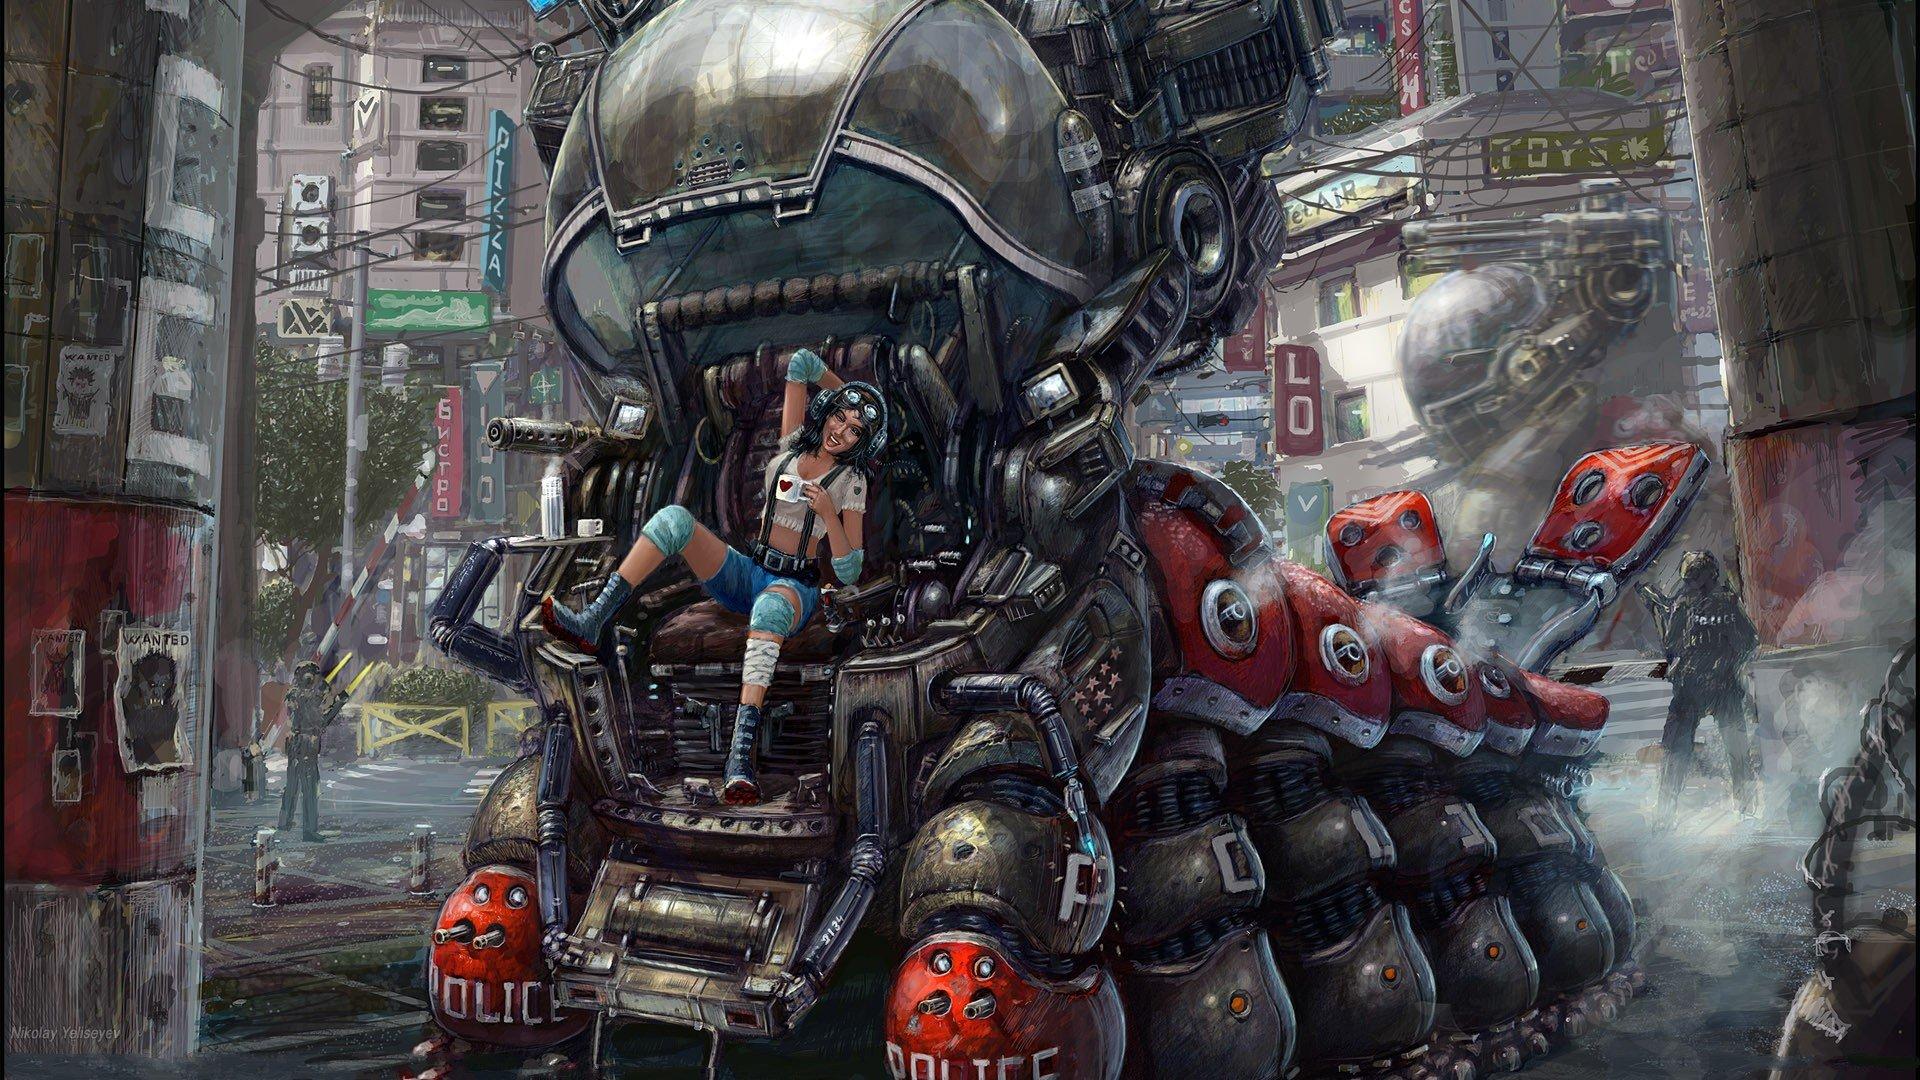 Download Cyberpunk Backgrounds 1920x1080